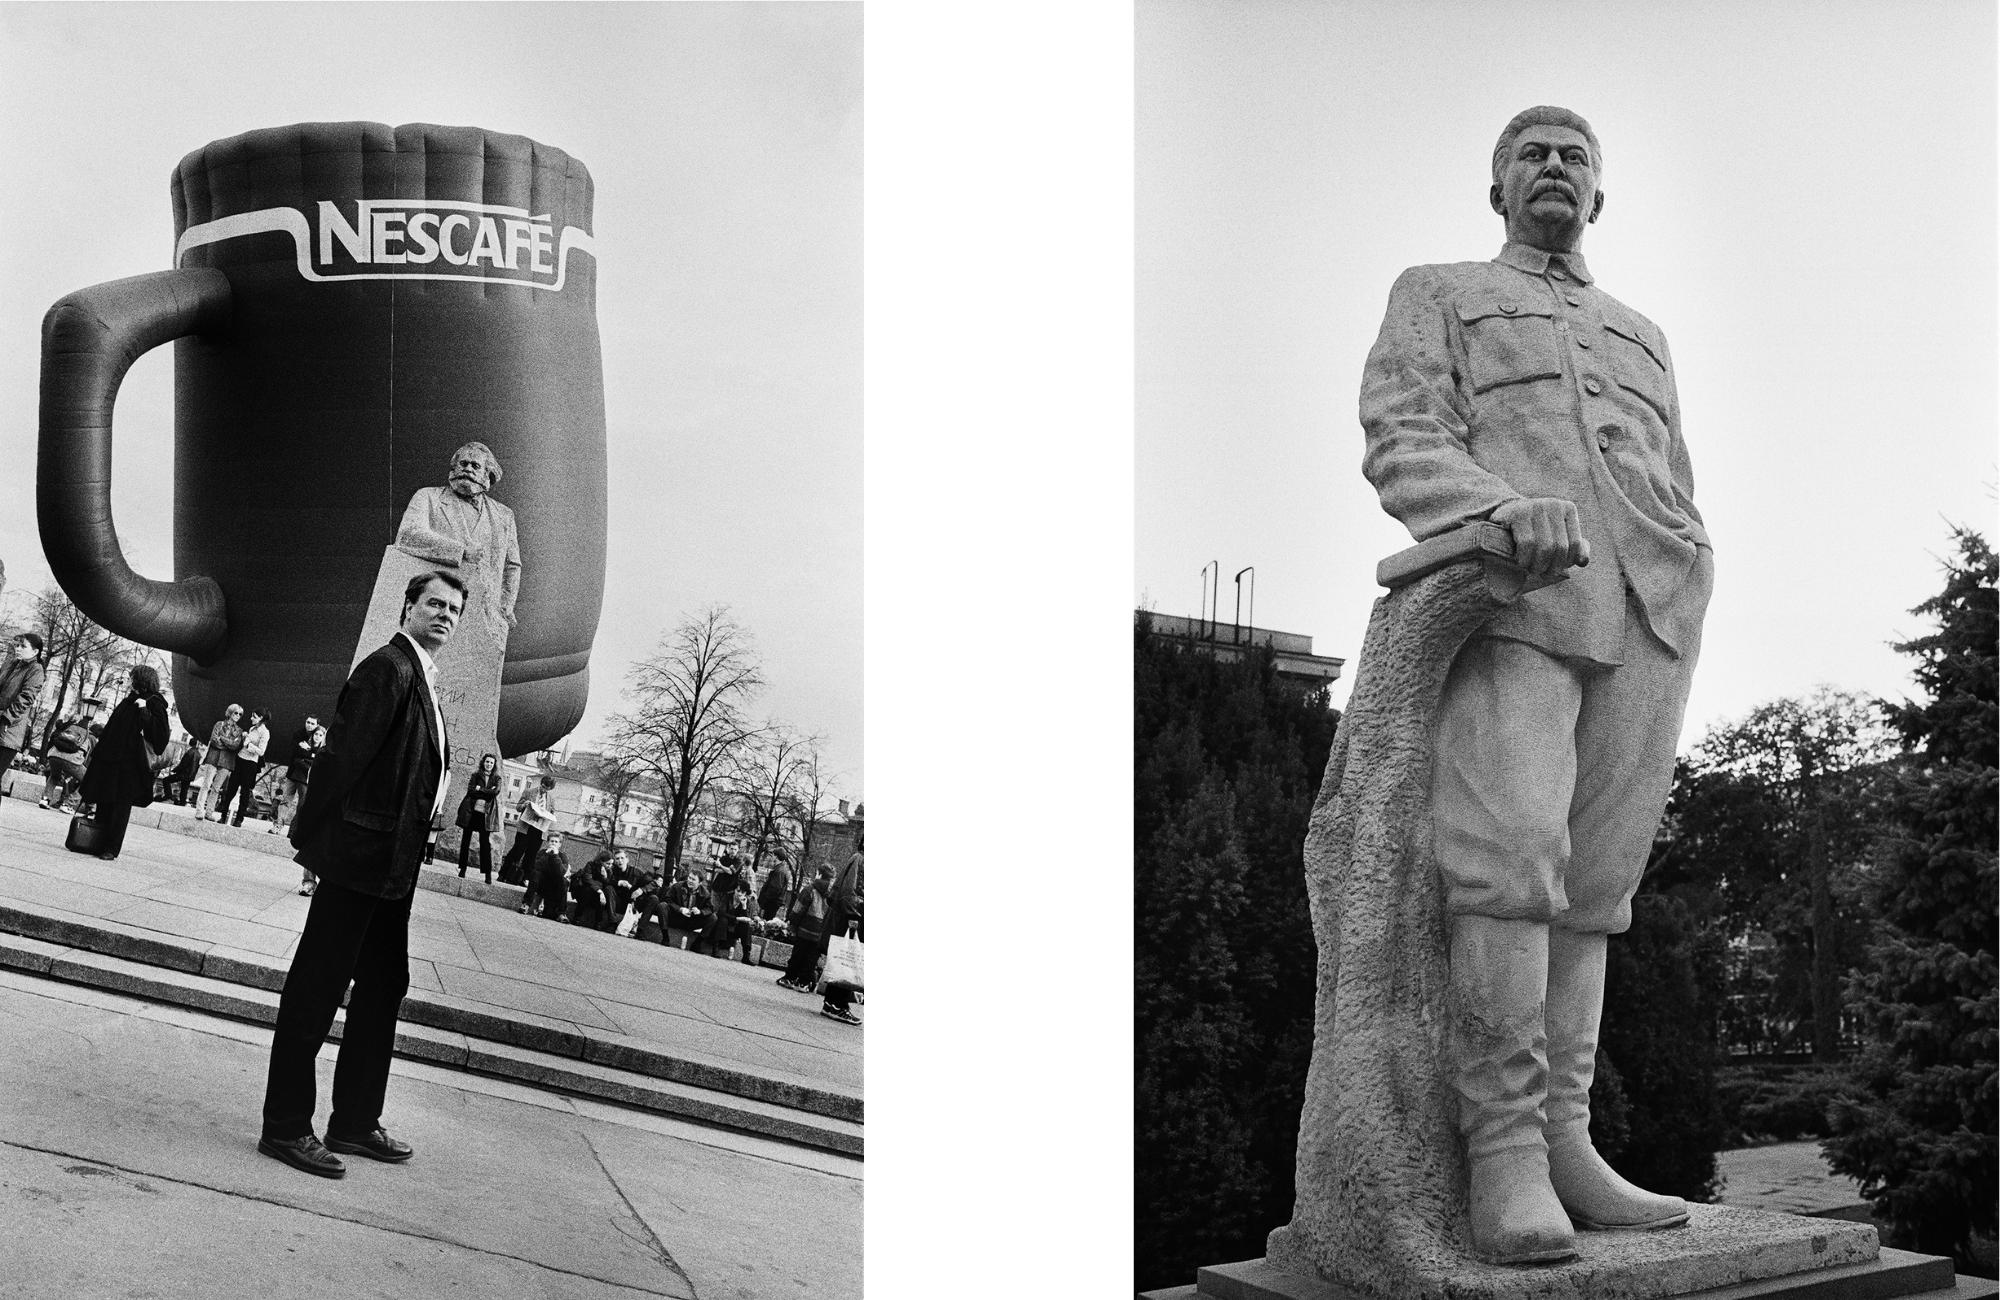 Linkes Foto – Karl Marx, Moskau, 2001 | Rechtes Foto – Josef Stalin, Gari, Georgien, 2017 / Fotos © Igor Mukhin